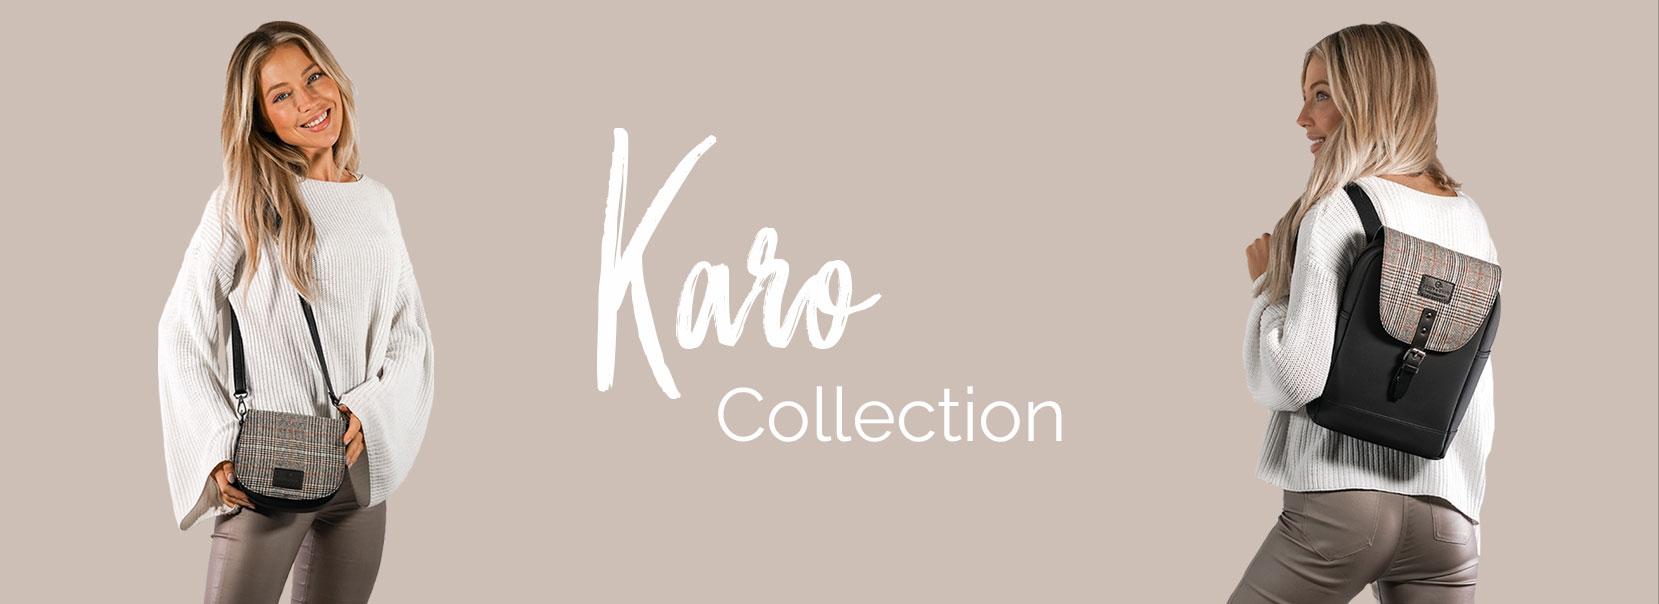 Karo Collection